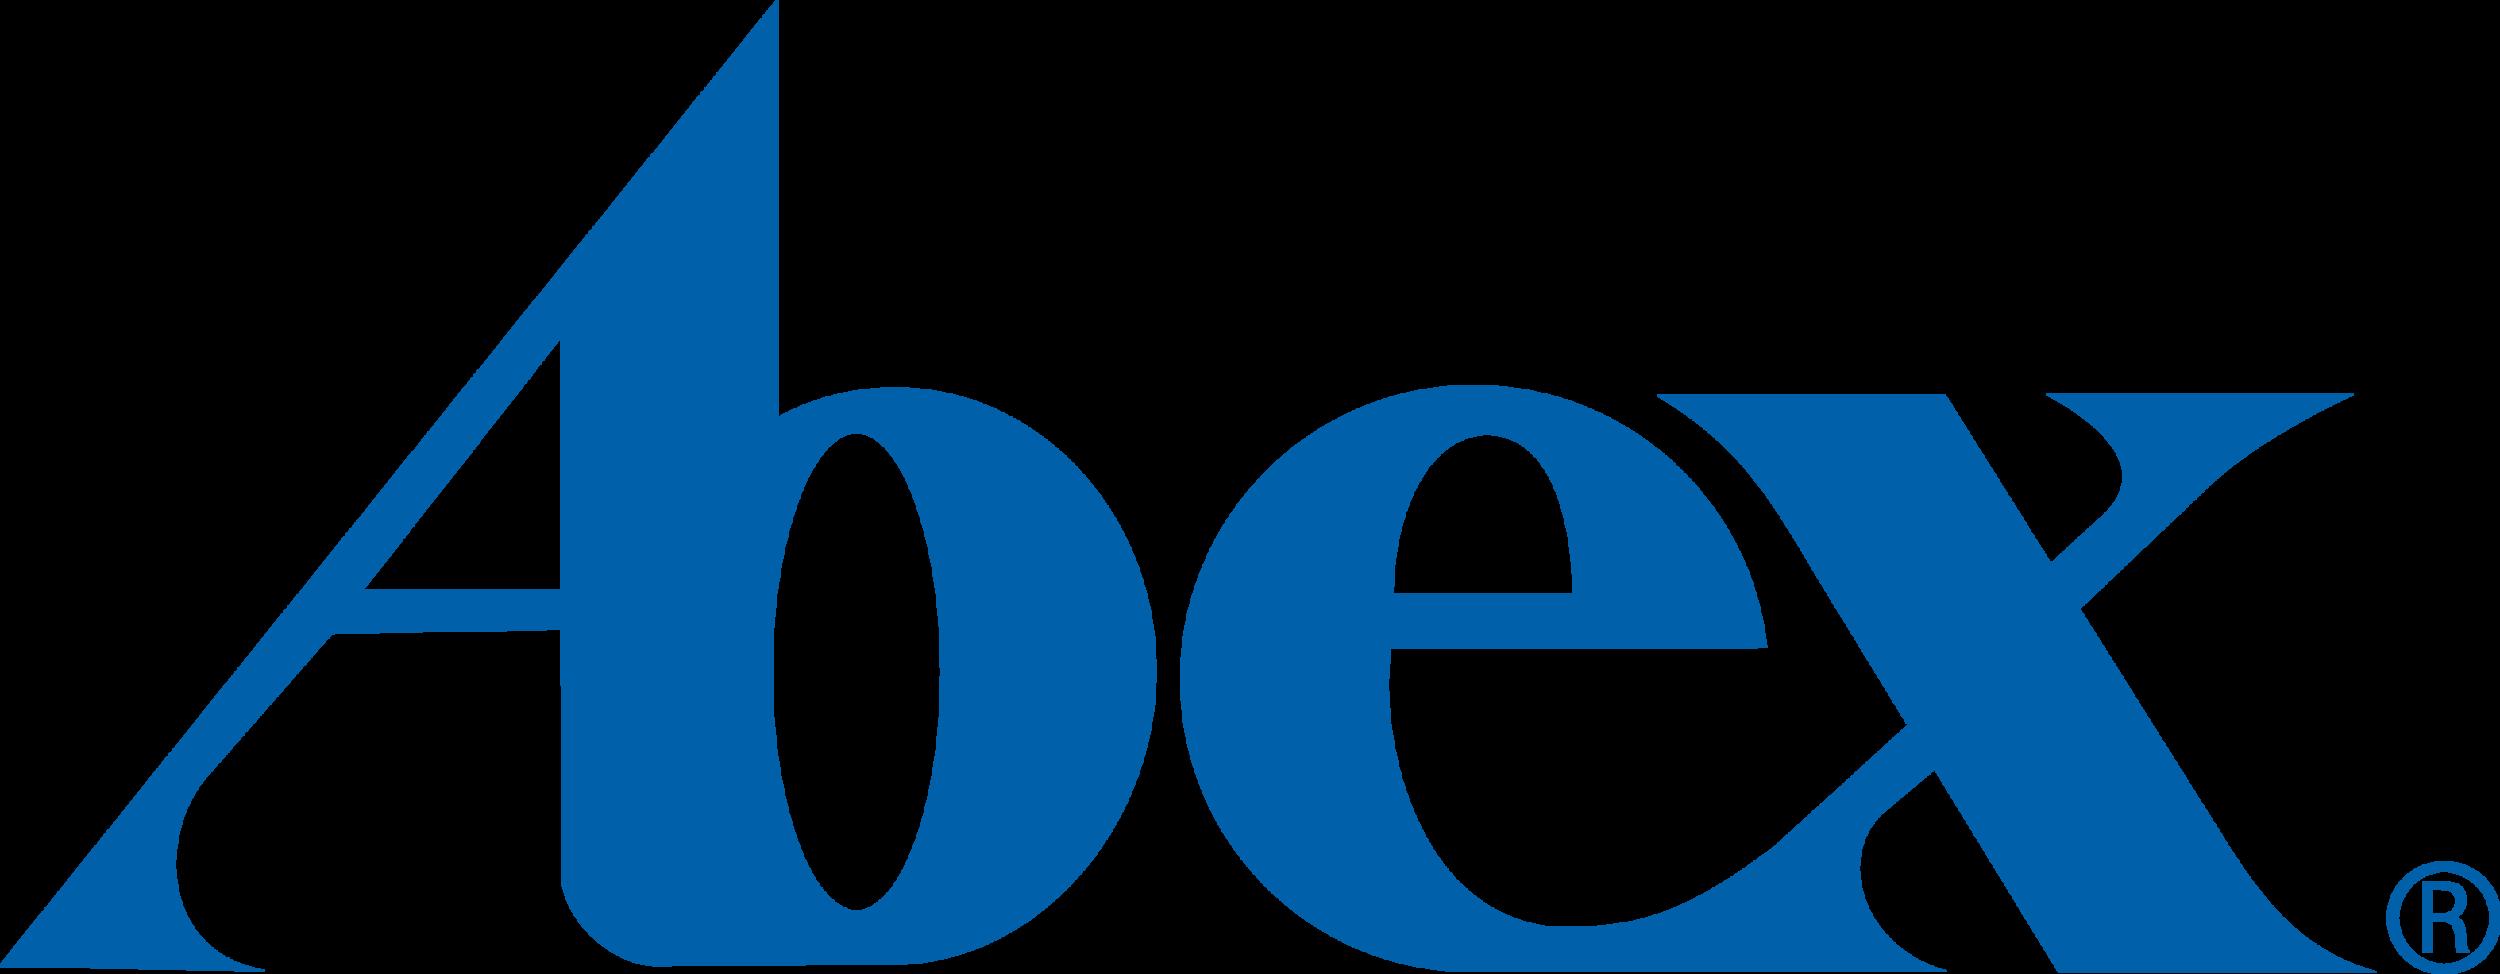 Abex logo